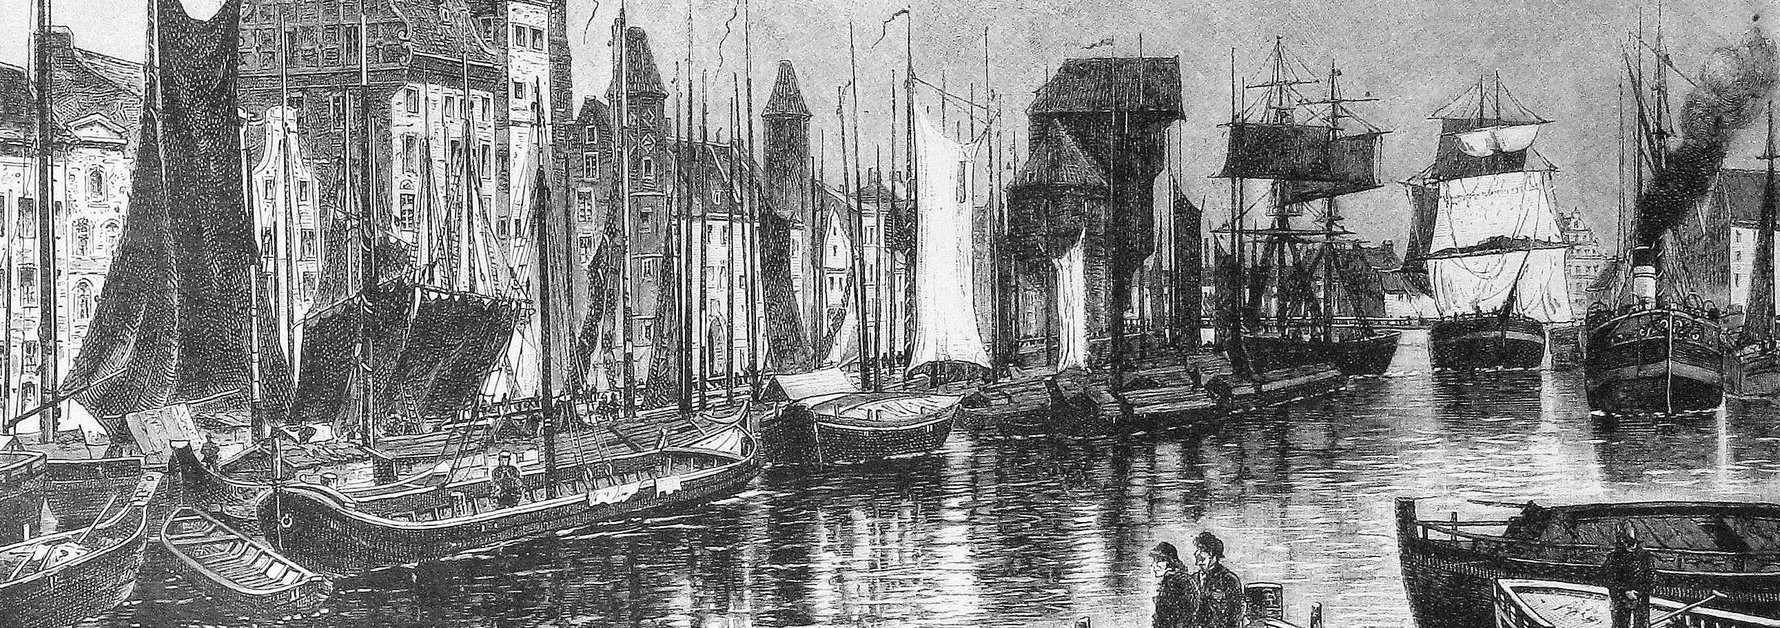 Die Gartenlaube (The Gazebo) Danzig, 1886